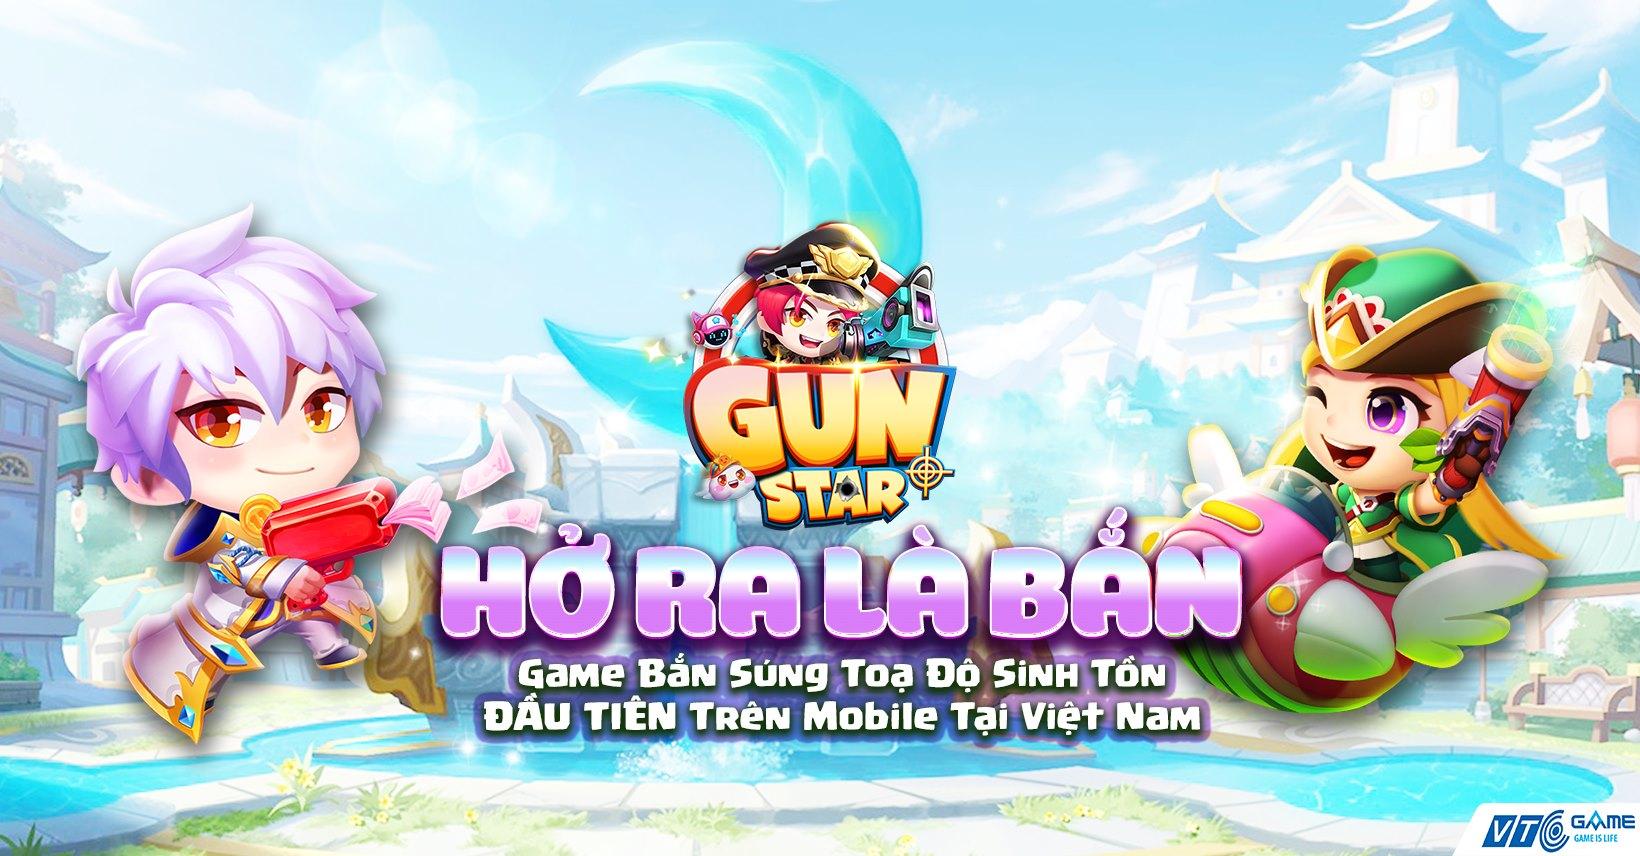 Code Gun Star VTC Game mới nhất 2021